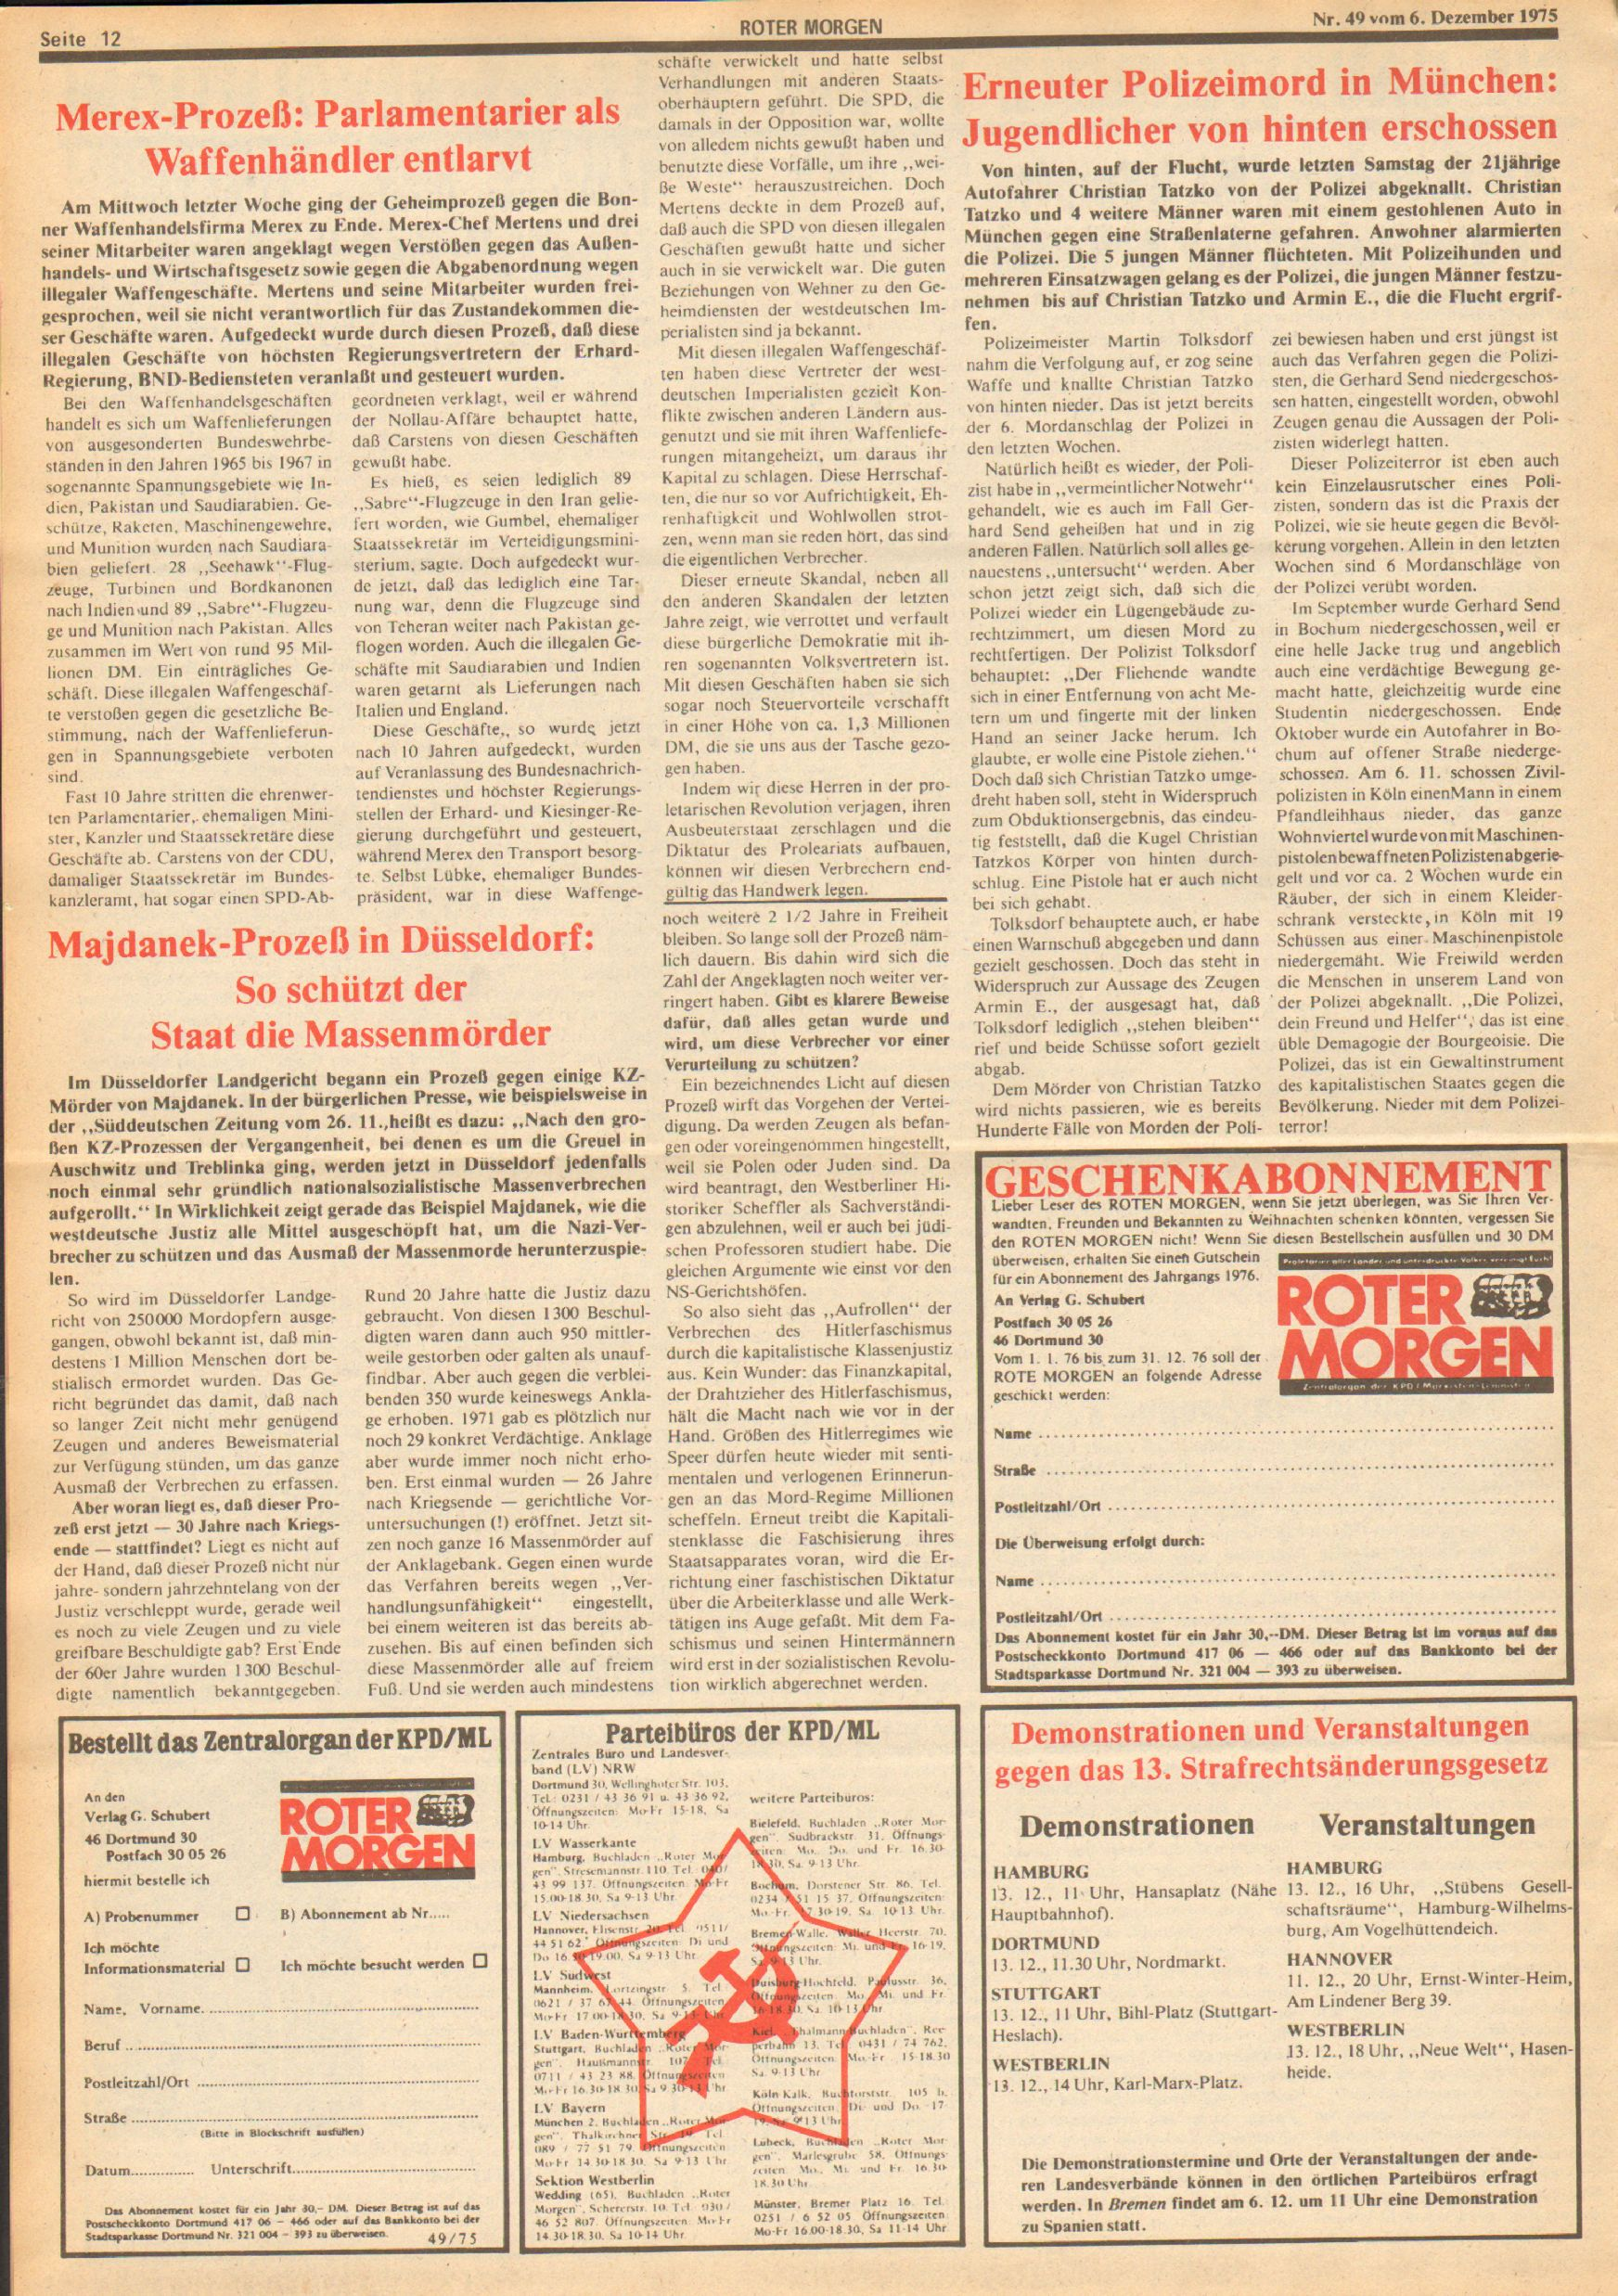 Roter Morgen, 9. Jg., 6. Dezember 1975, Nr. 49, Seite 12